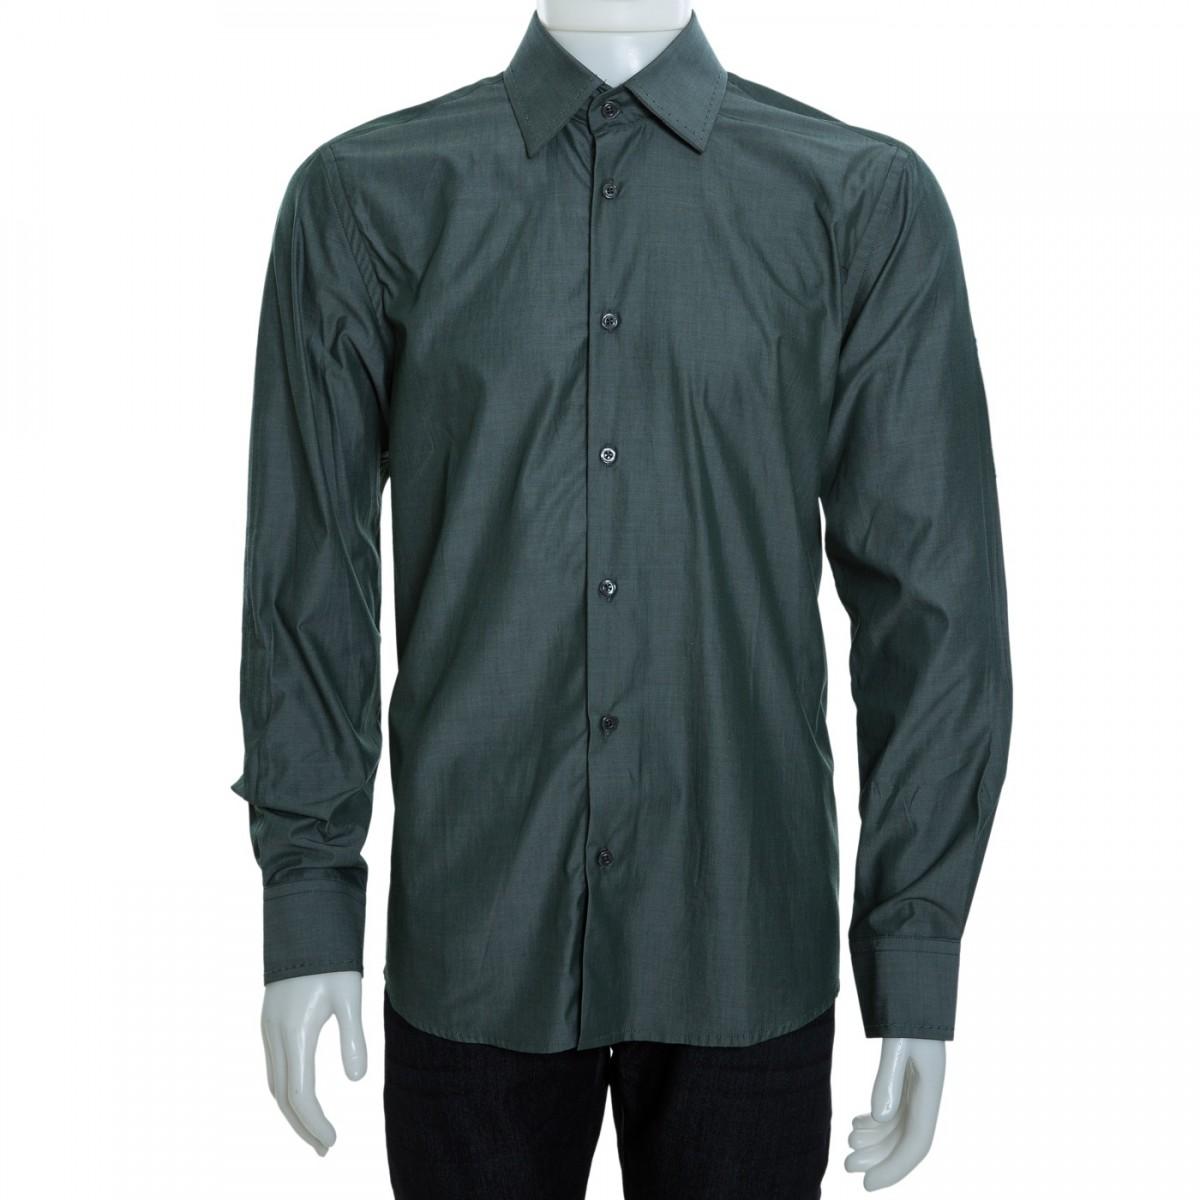 02bc95e3f4c36 Bizz Store - Camisa Social Masculina Luiz Eugenio Slim Manga Longa